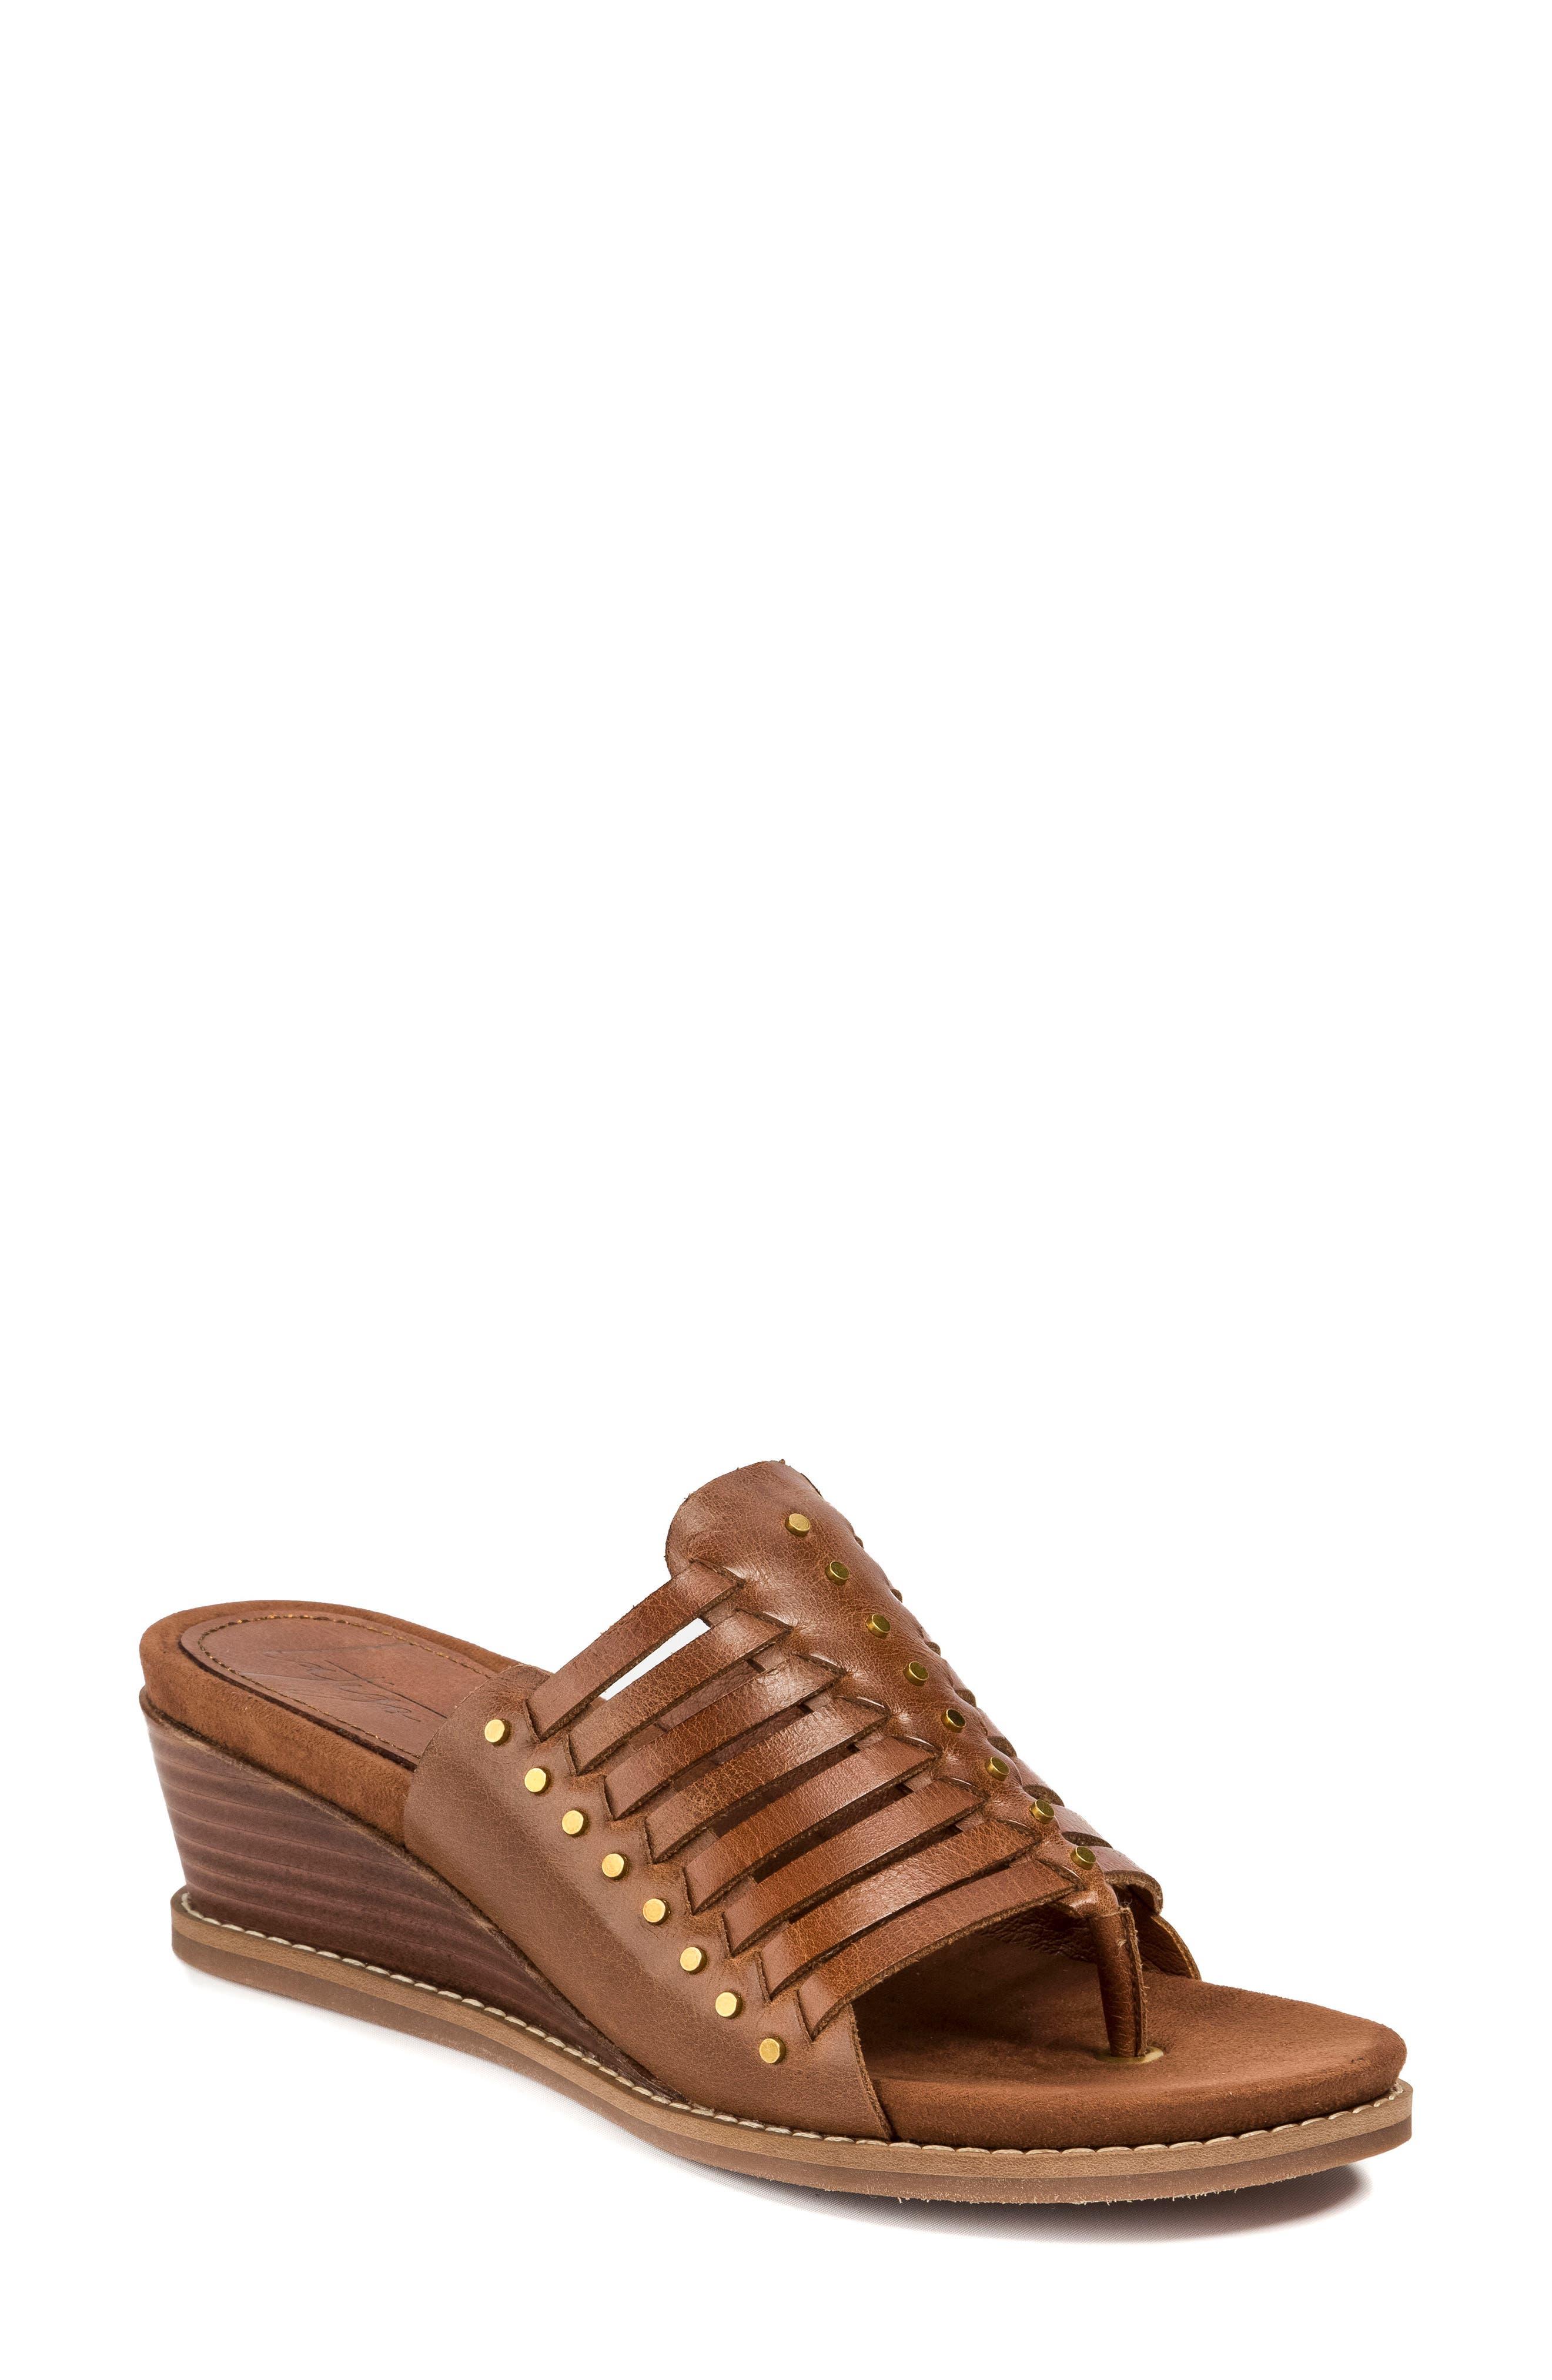 Winnie Wedge Sandal,                             Main thumbnail 1, color,                             Brush Brown Leather